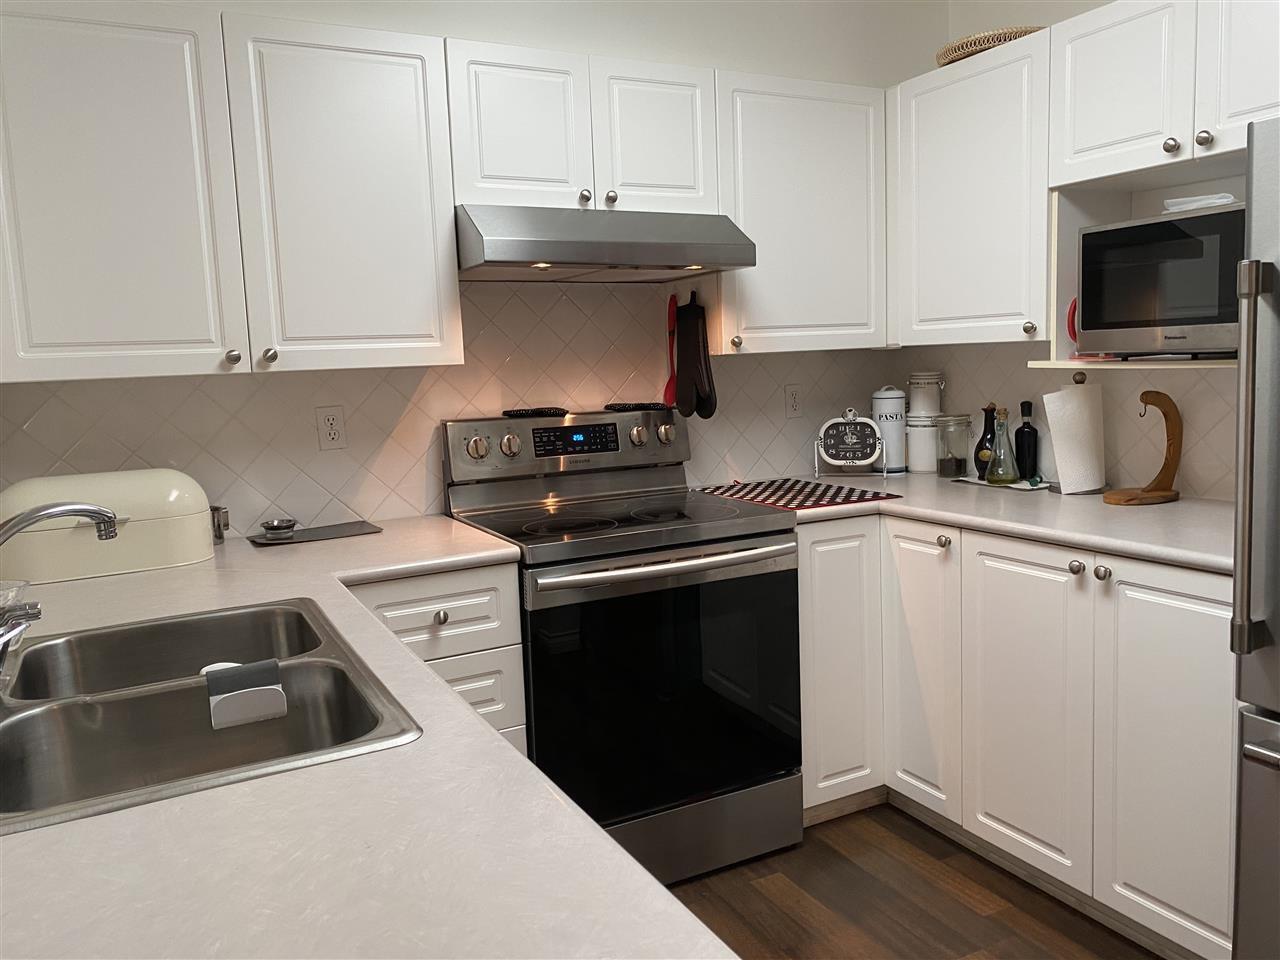 Photo 10: Photos: 304 1369 56 STREET in Delta: Cliff Drive Condo for sale (Tsawwassen)  : MLS®# R2464890